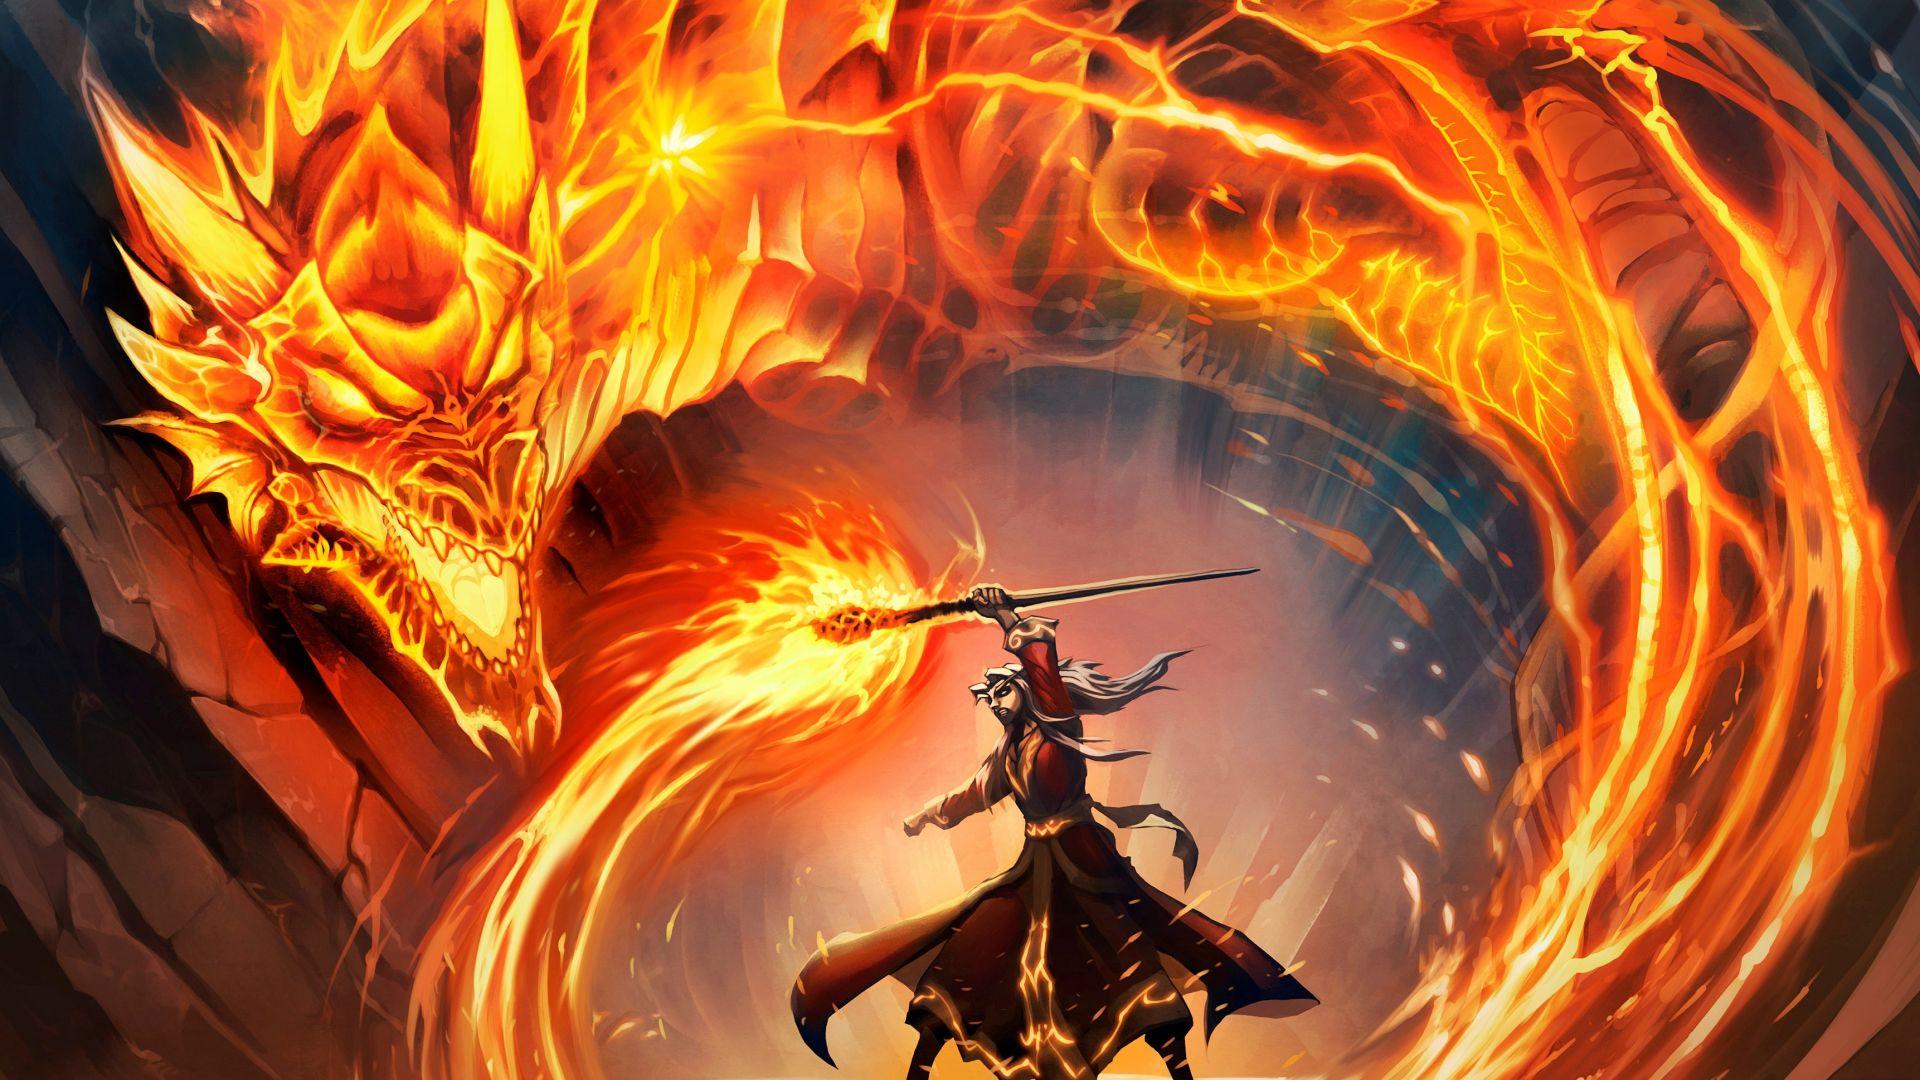 Wallpaper Hearthstone, Hearthstone: Heroes of Warcraft online game, warrior, dragon